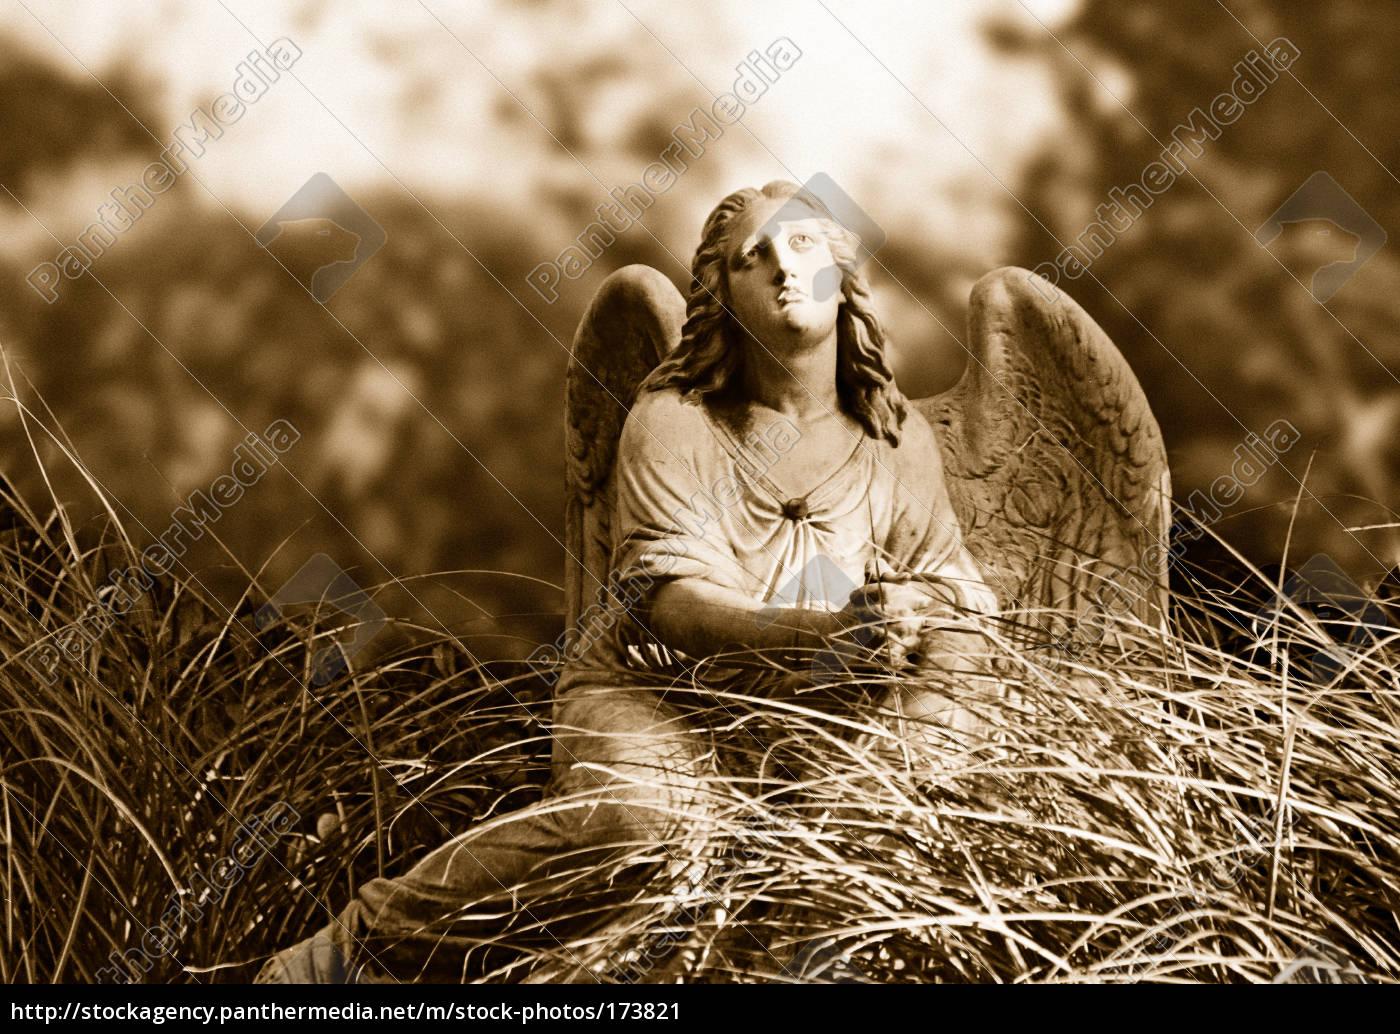 angel - 173821